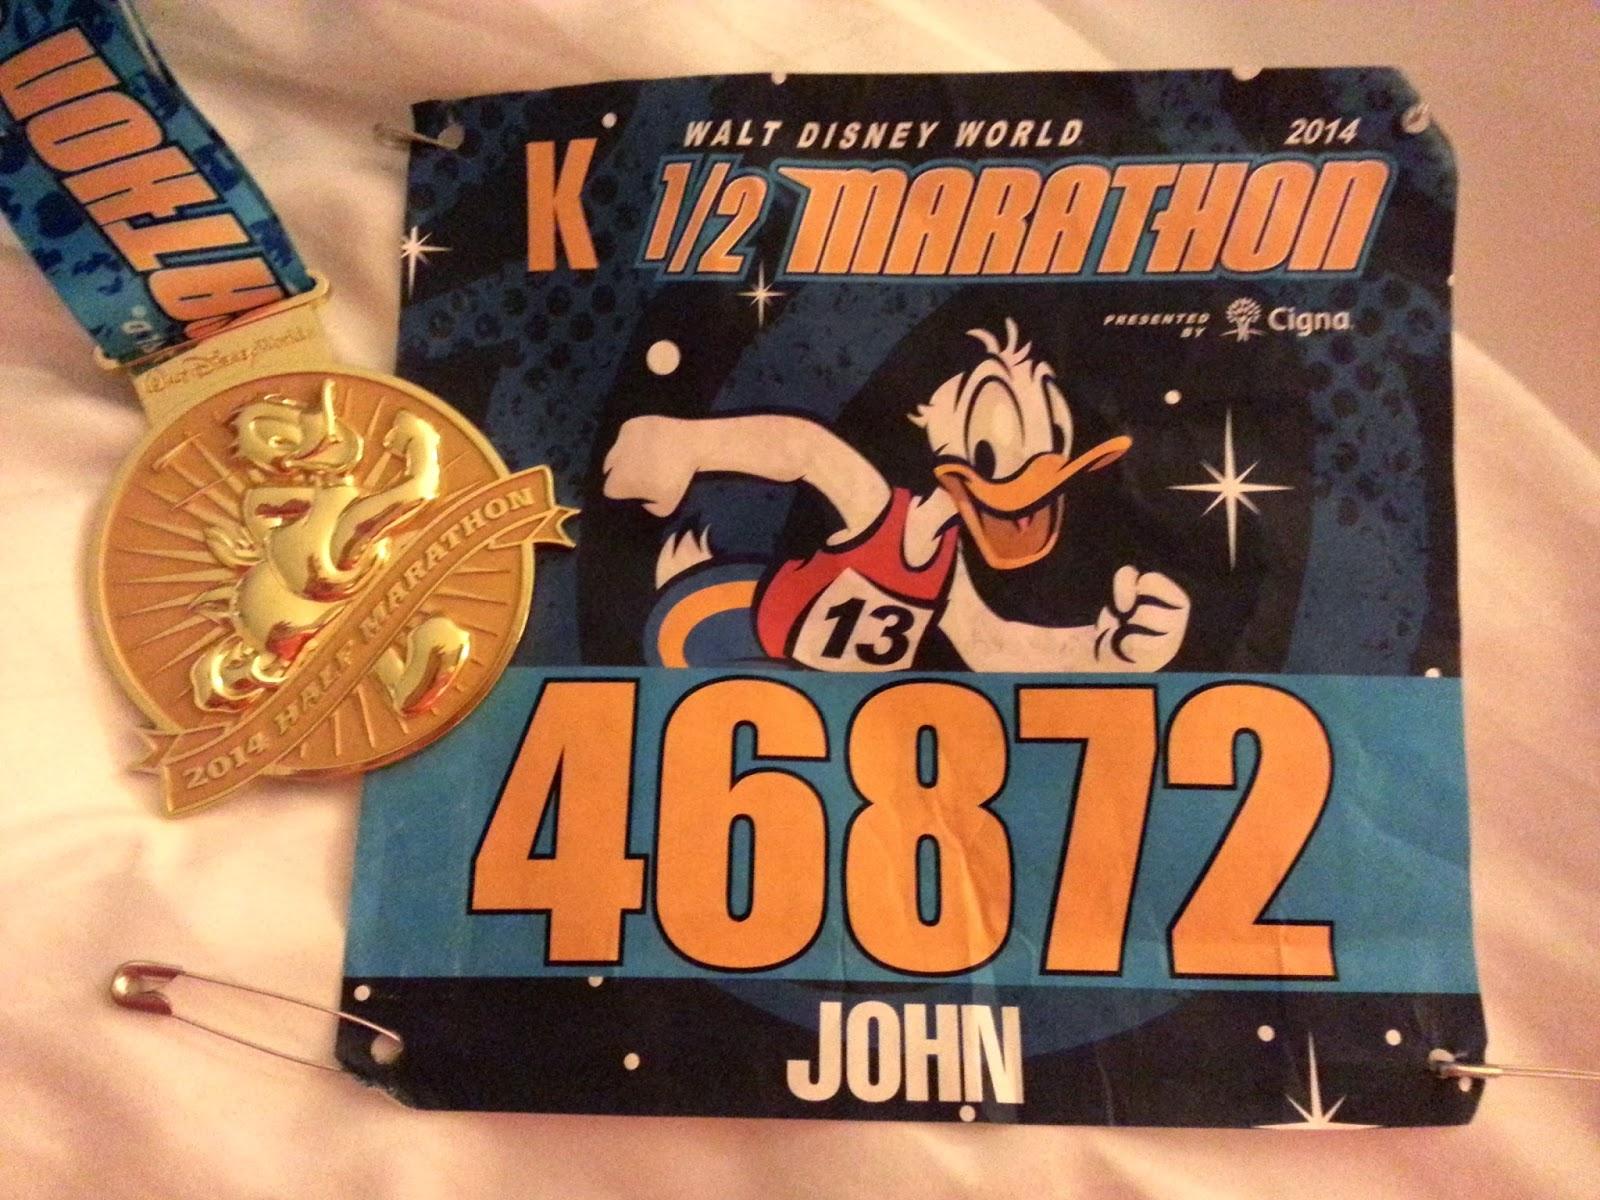 WDW 1/2 Marathon bib and medal